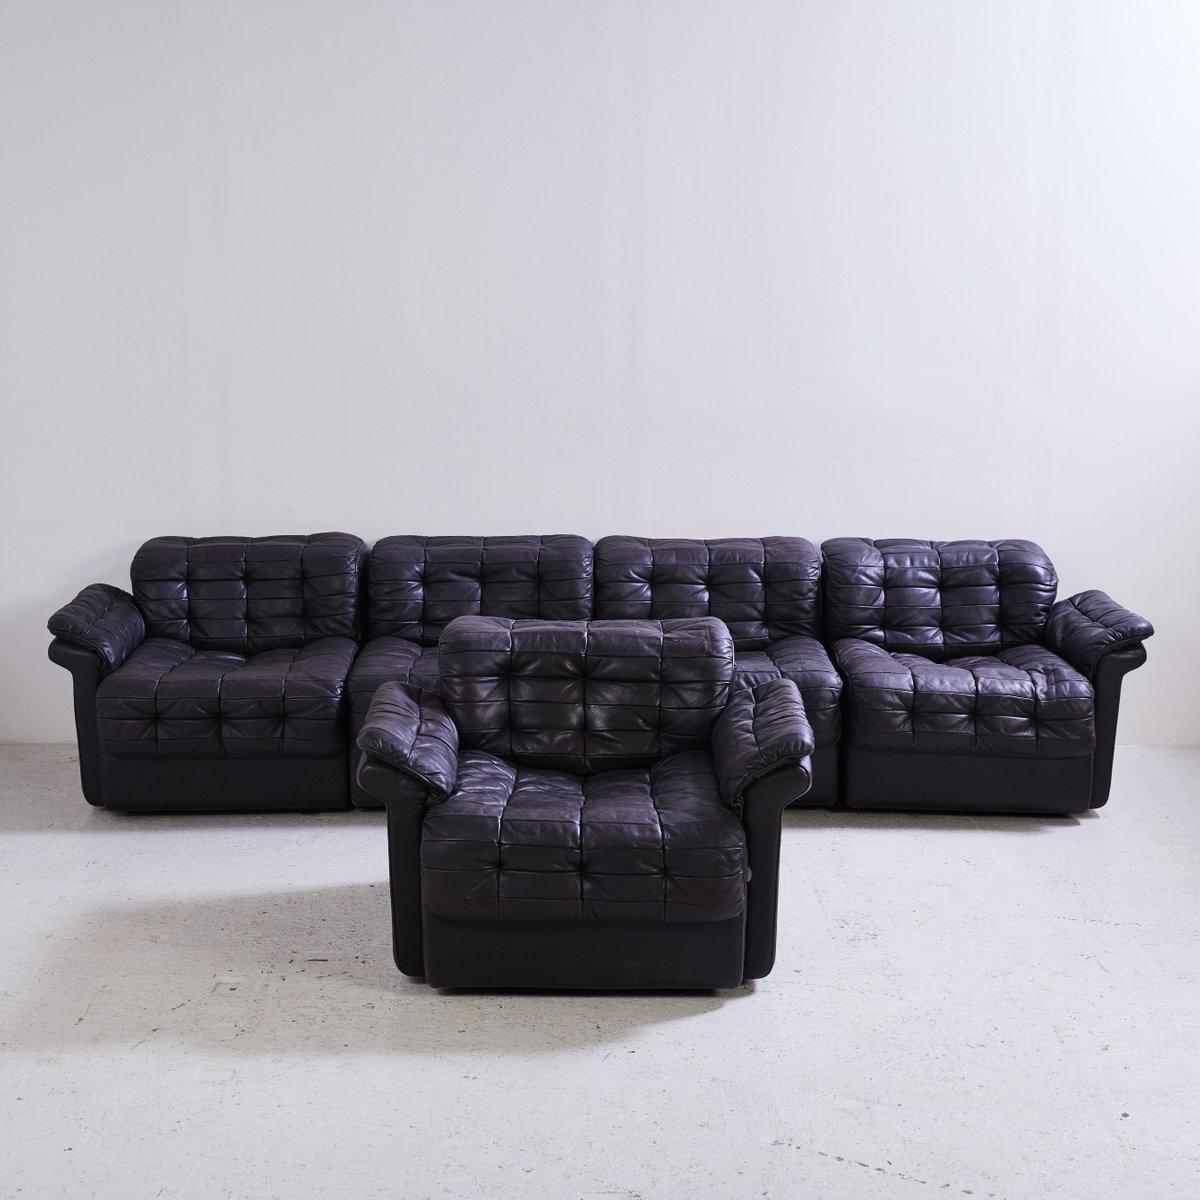 Model Ds 11 Black Leather Modular Sofa From De Sede 1970s